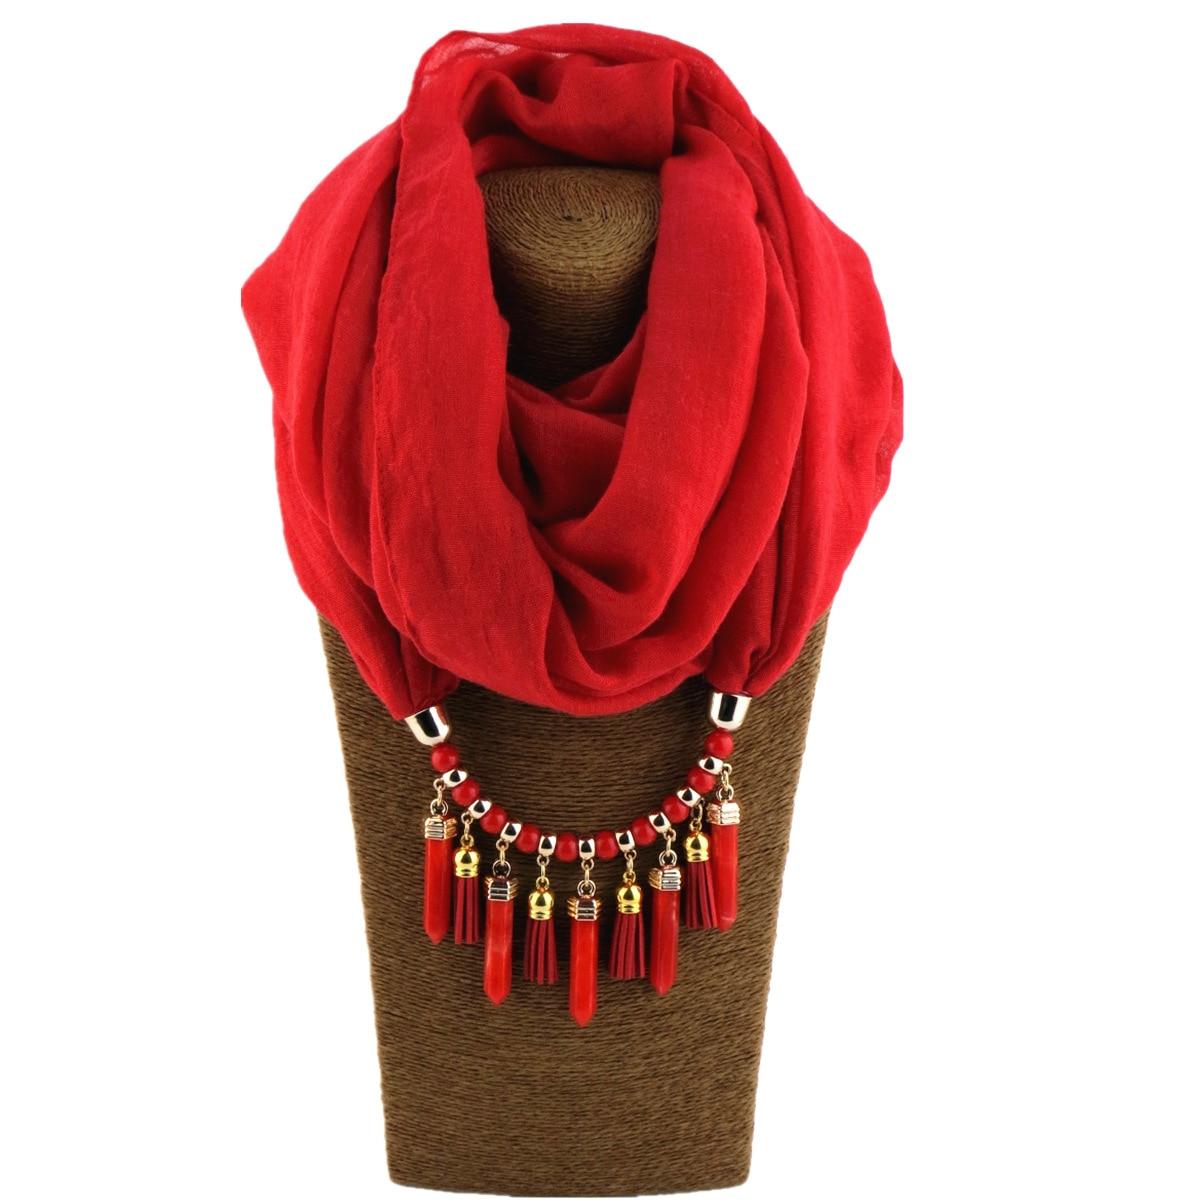 seasons new fashion cotton scarf velvet pendant quality TR Tassel stone jewelry solid color